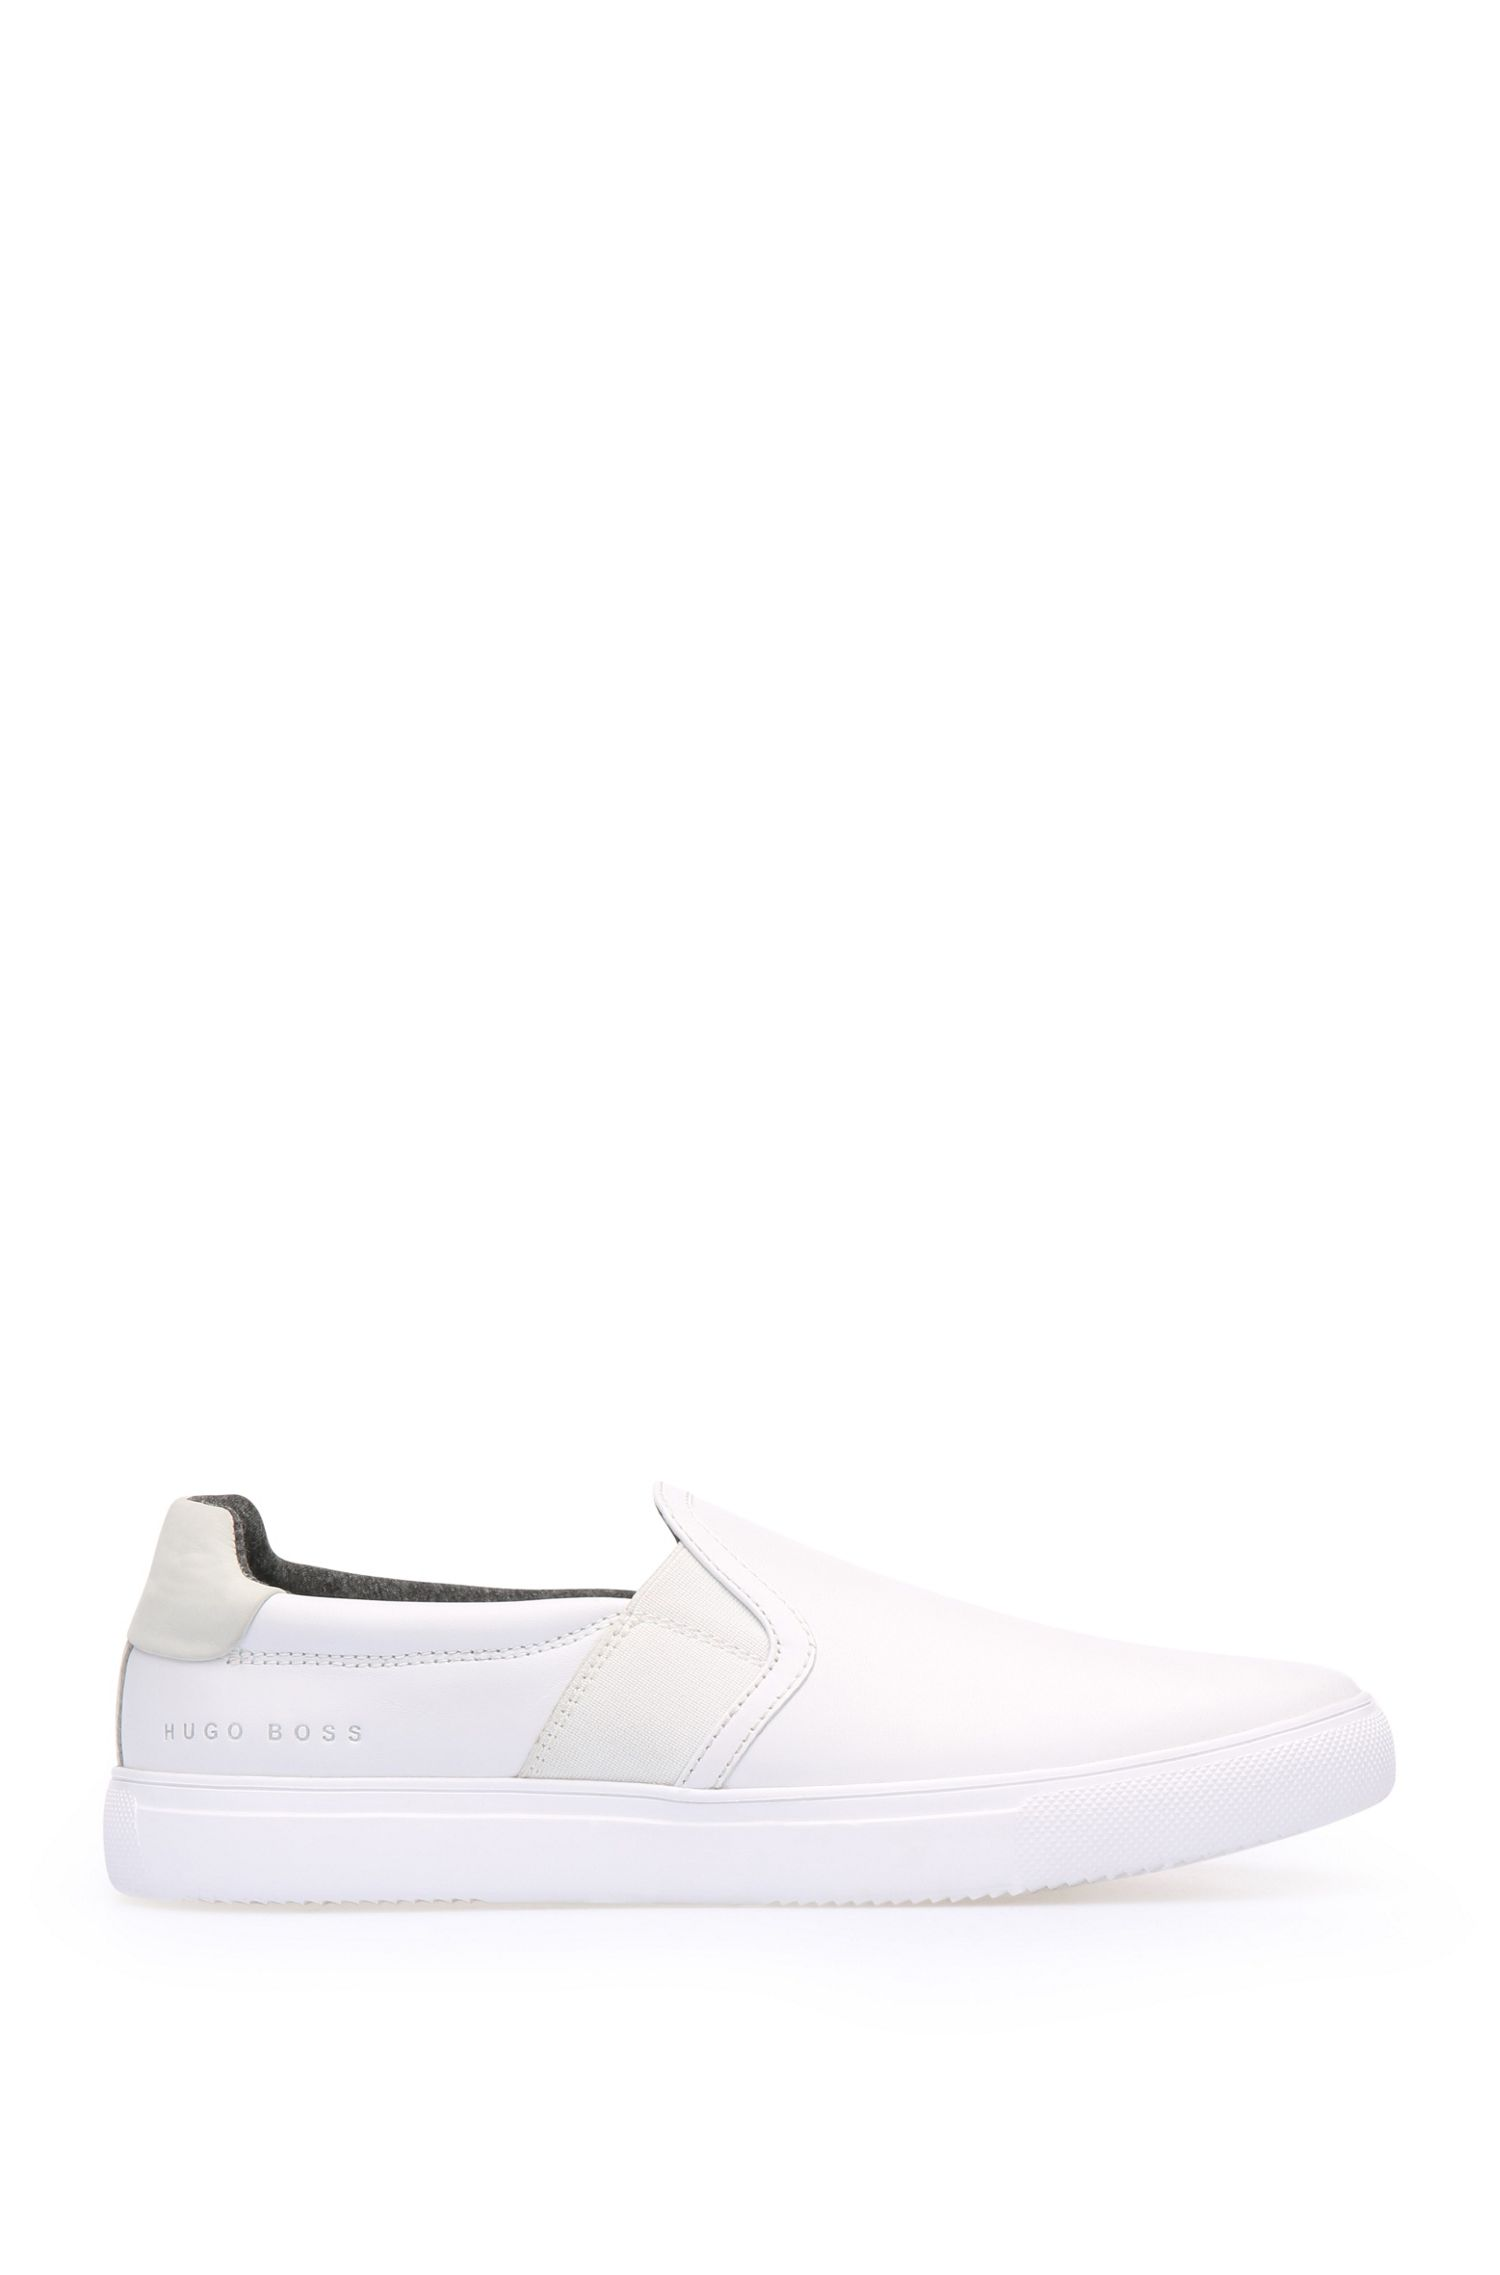 Sneakers aus Glattleder mit Nubukpartien: ´Enlight_Slon_lt`